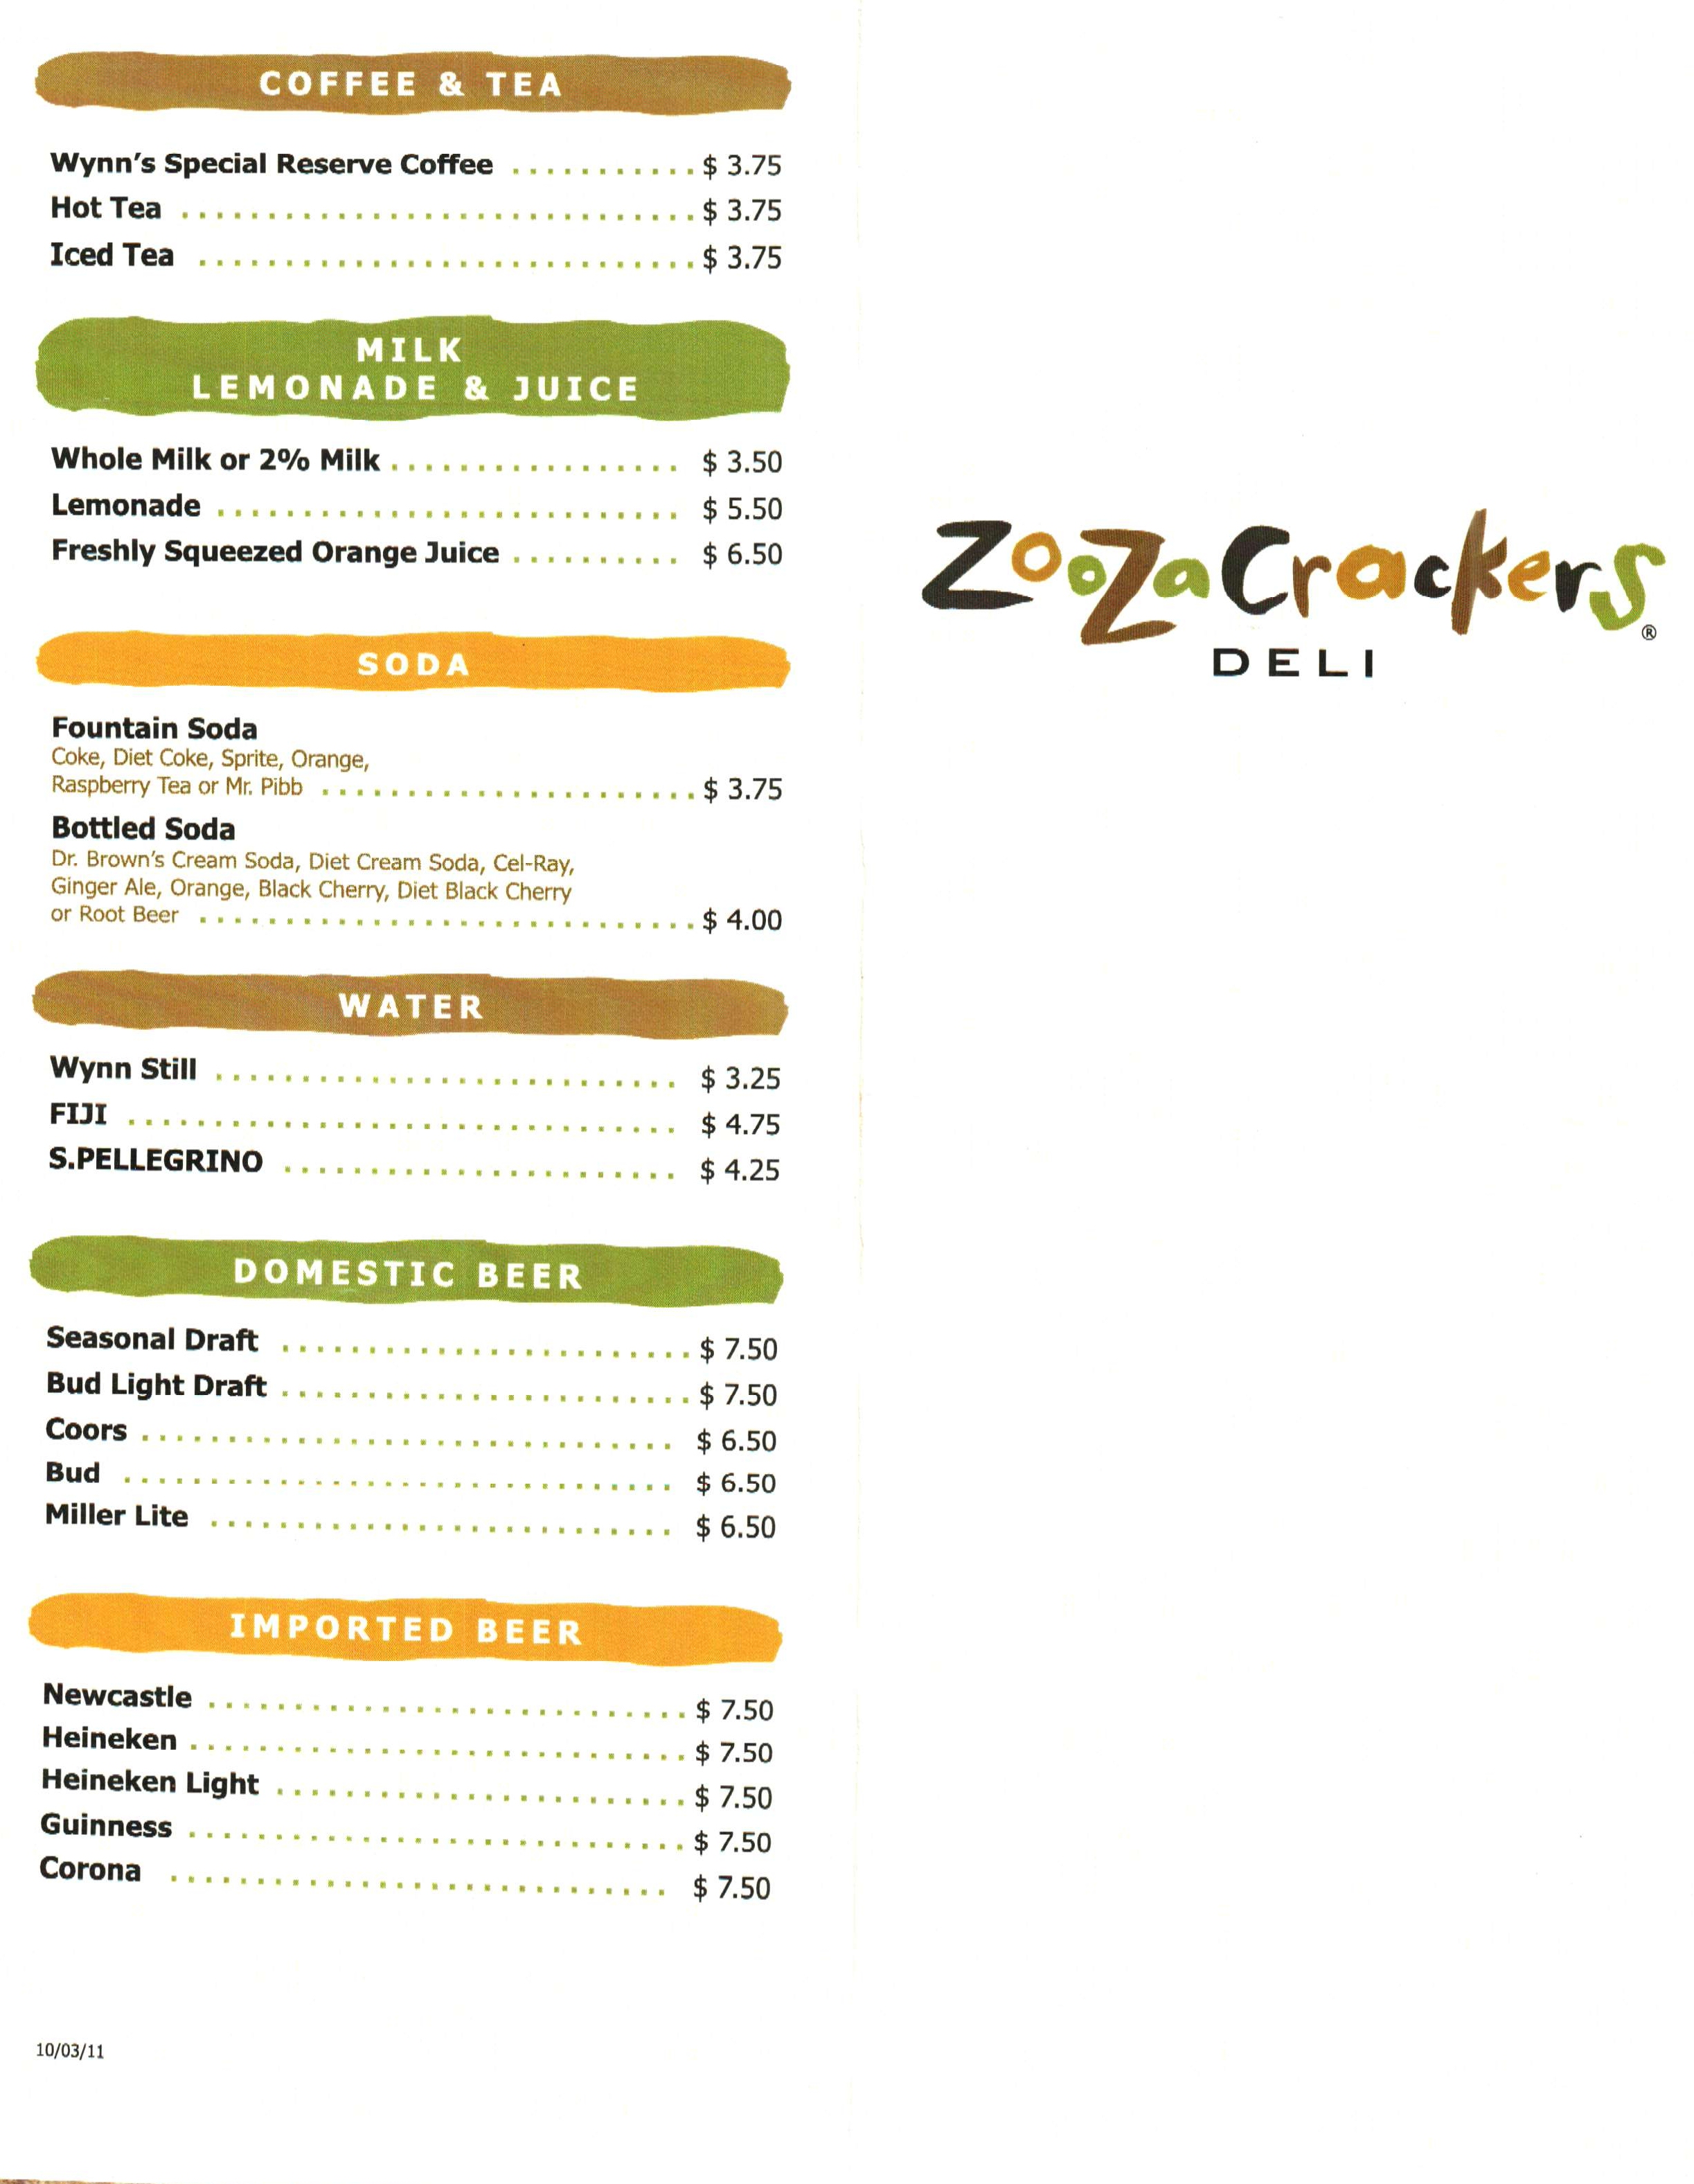 ZooZa Crackers Deli Menu